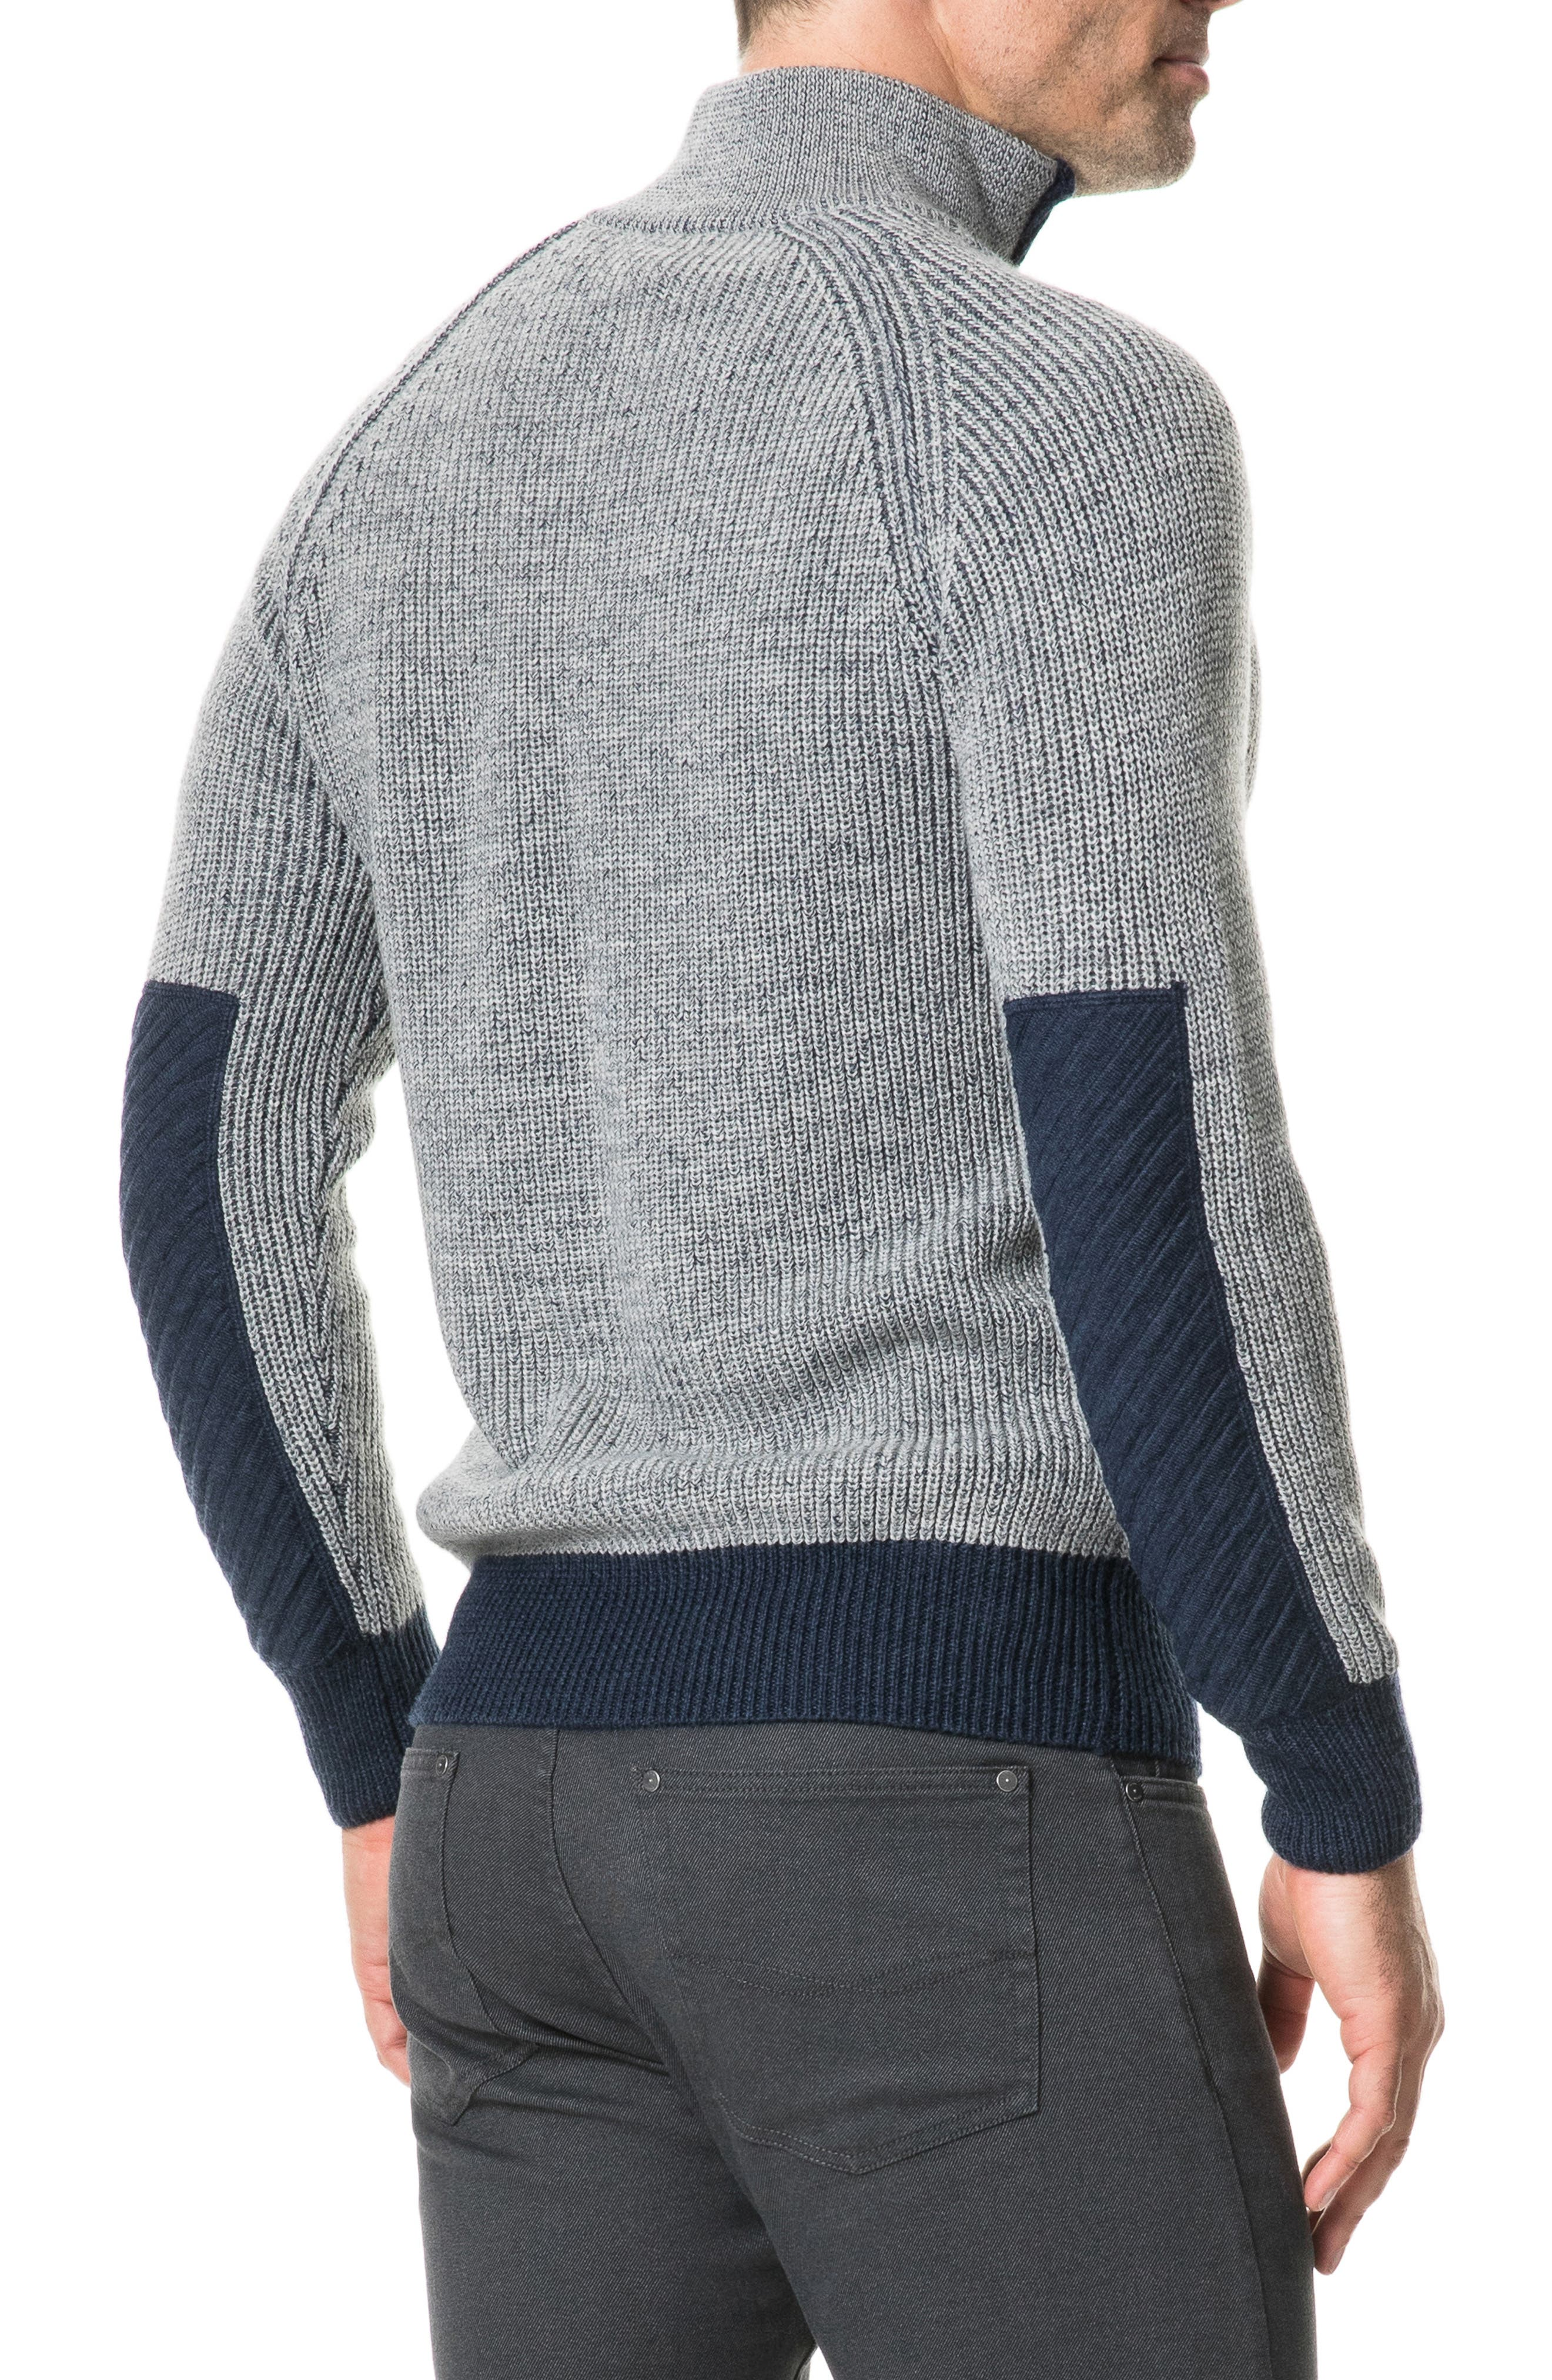 Mackinder Quarter Zip Merino Wool Sweater,                             Alternate thumbnail 2, color,                             268